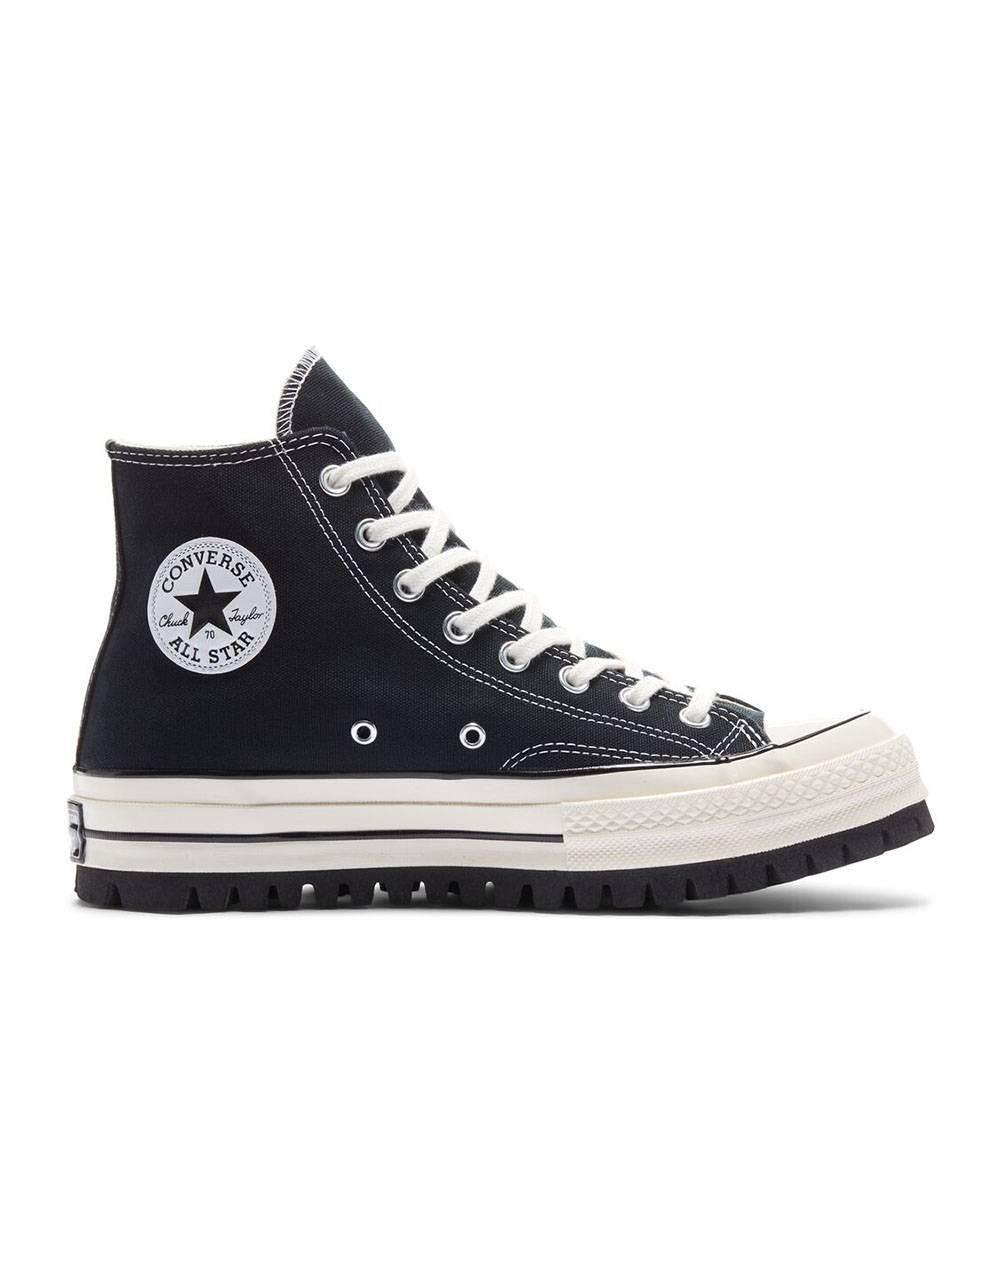 Converse Woman Trek Chuck 70 High Top - blacktrek vintage Converse Sneakers 145,00€